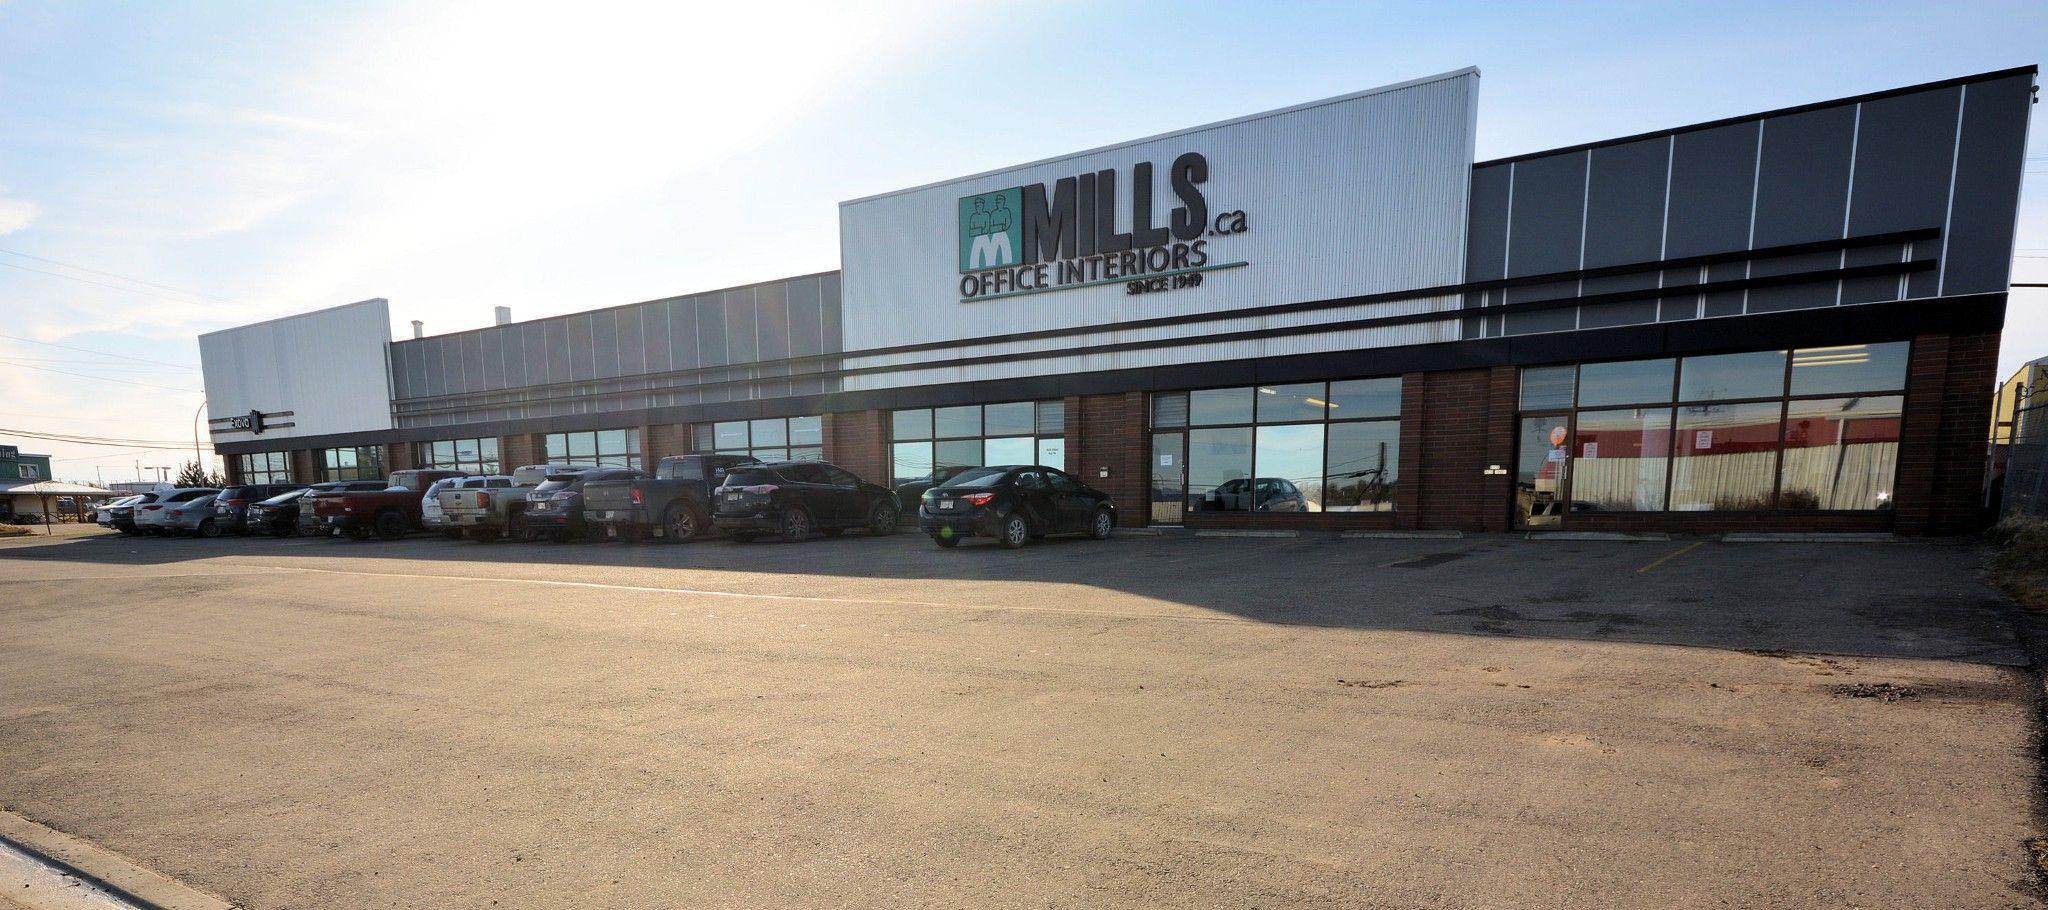 Photo 1: Photos: 8822 100 Street in Fort St. John: Fort St. John - City SW Industrial for sale (Fort St. John (Zone 60))